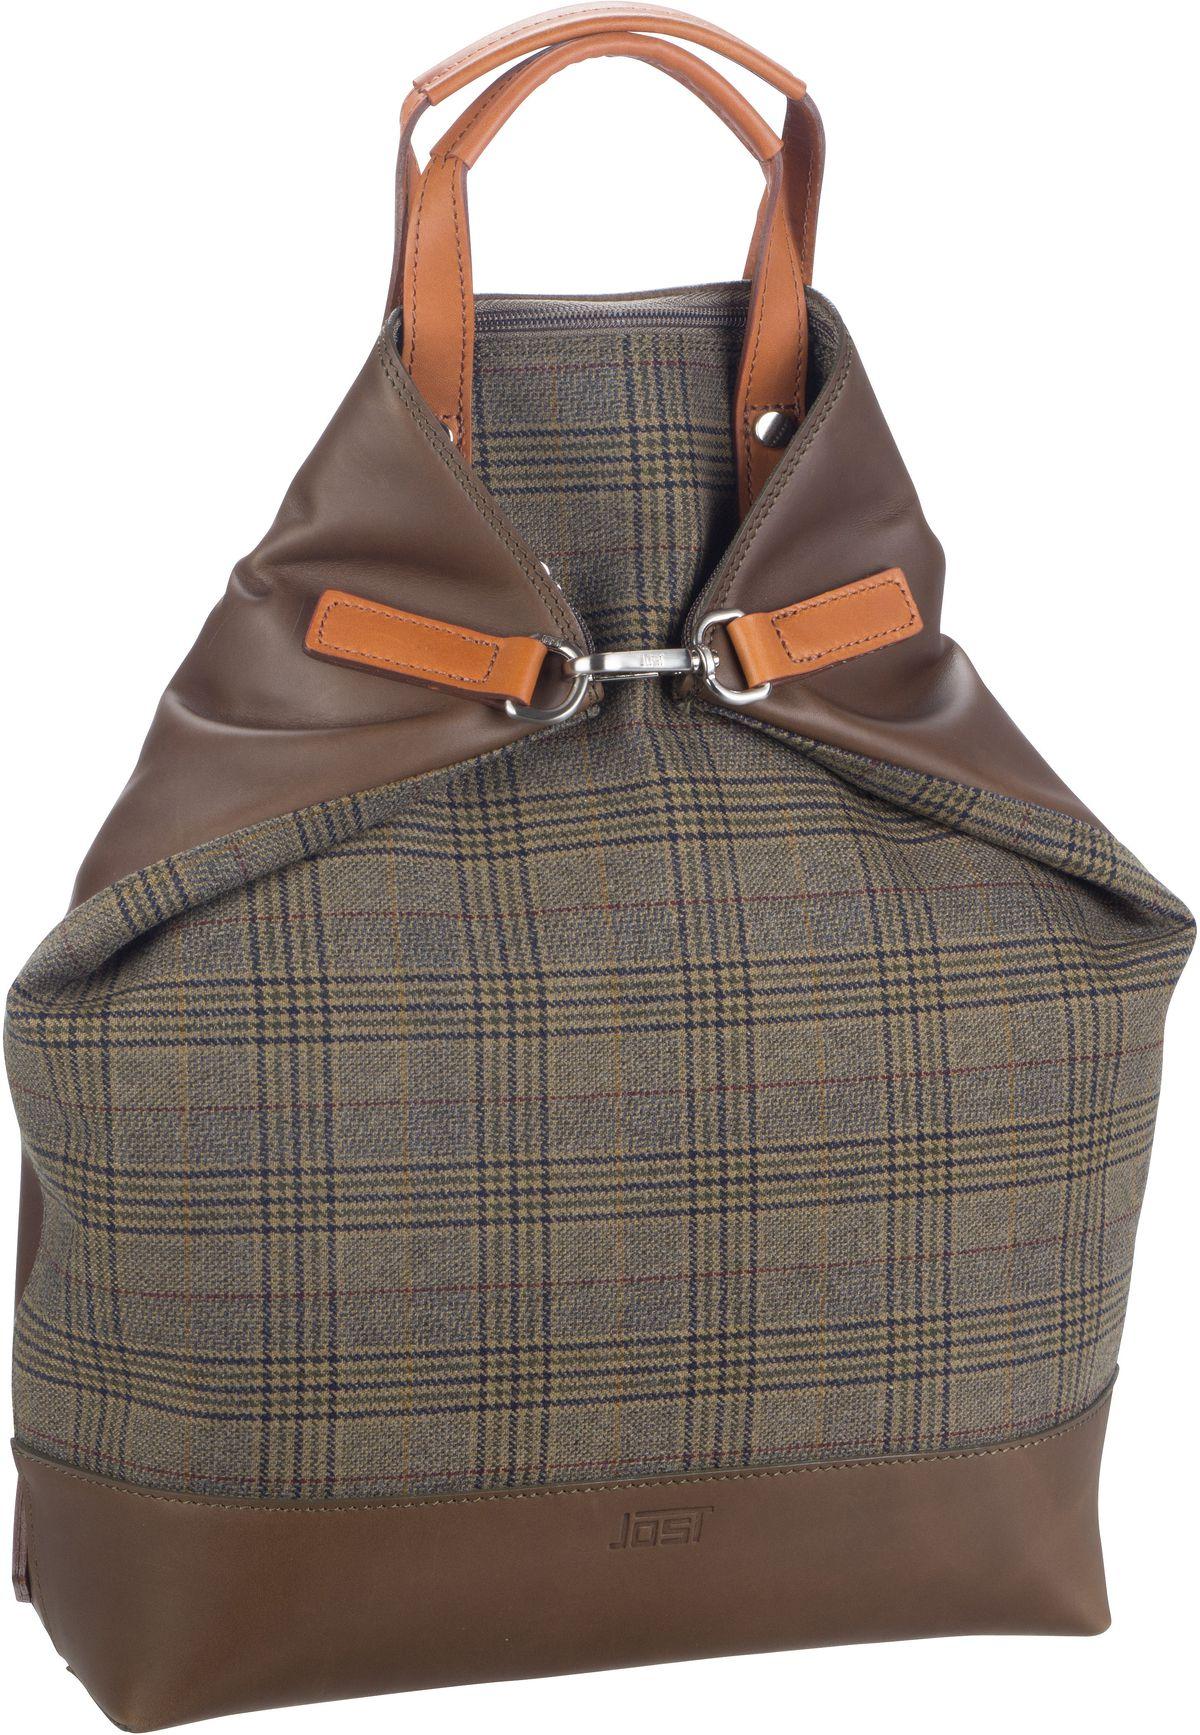 Rucksack / Daypack Checks 7235 X-Change Bag S Olive